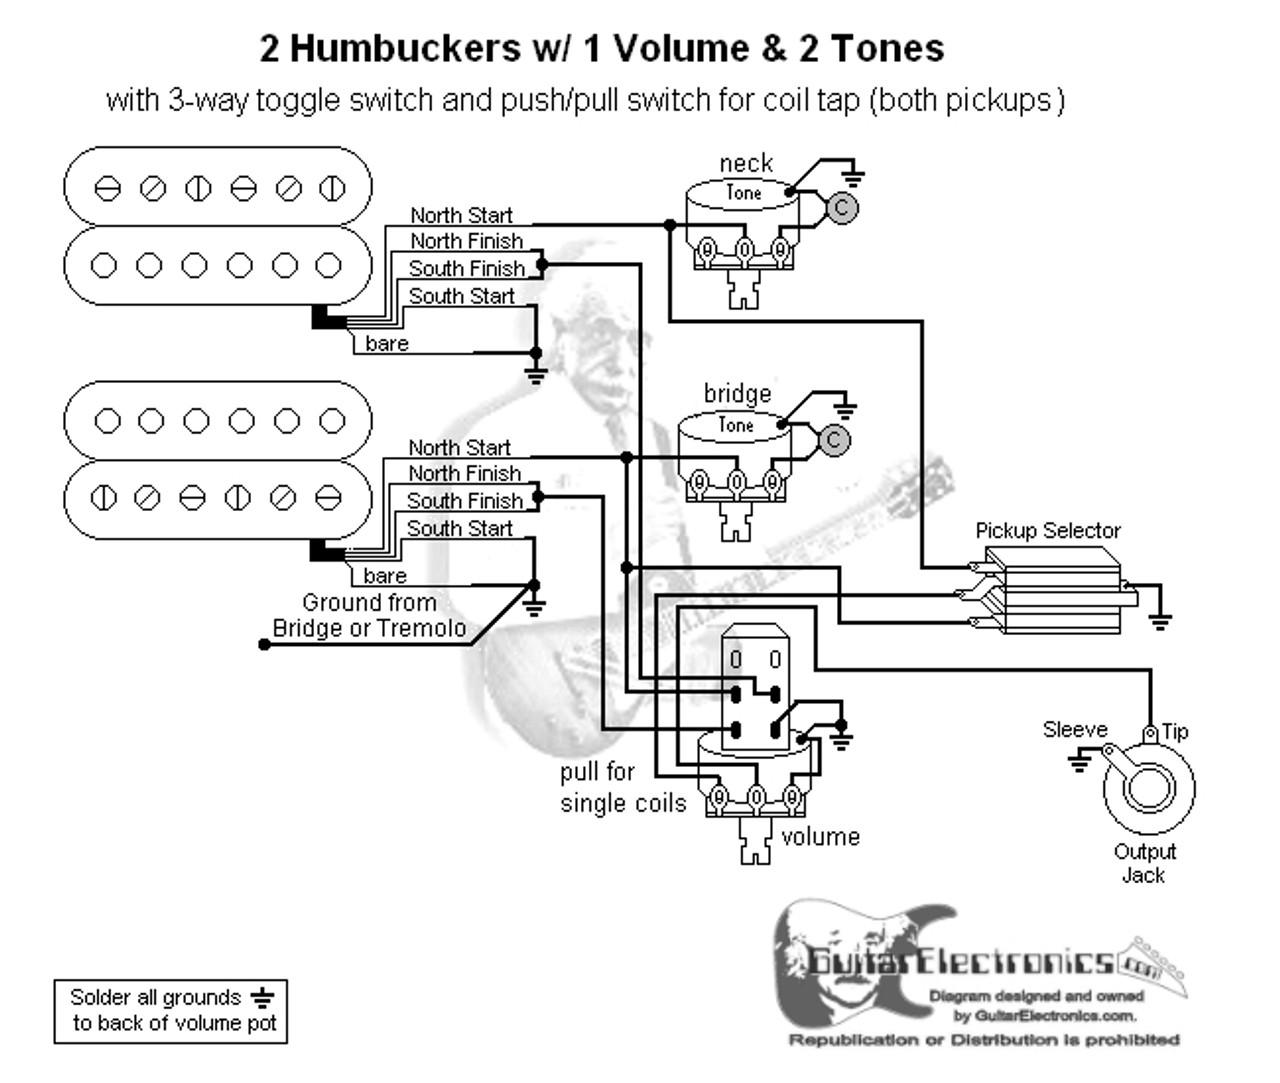 2 humbuckers 3 way toggle switch 1 volume 2 tones coil tapwd2hh3t12_01__40428 1470694392 jpg?c\u003d2